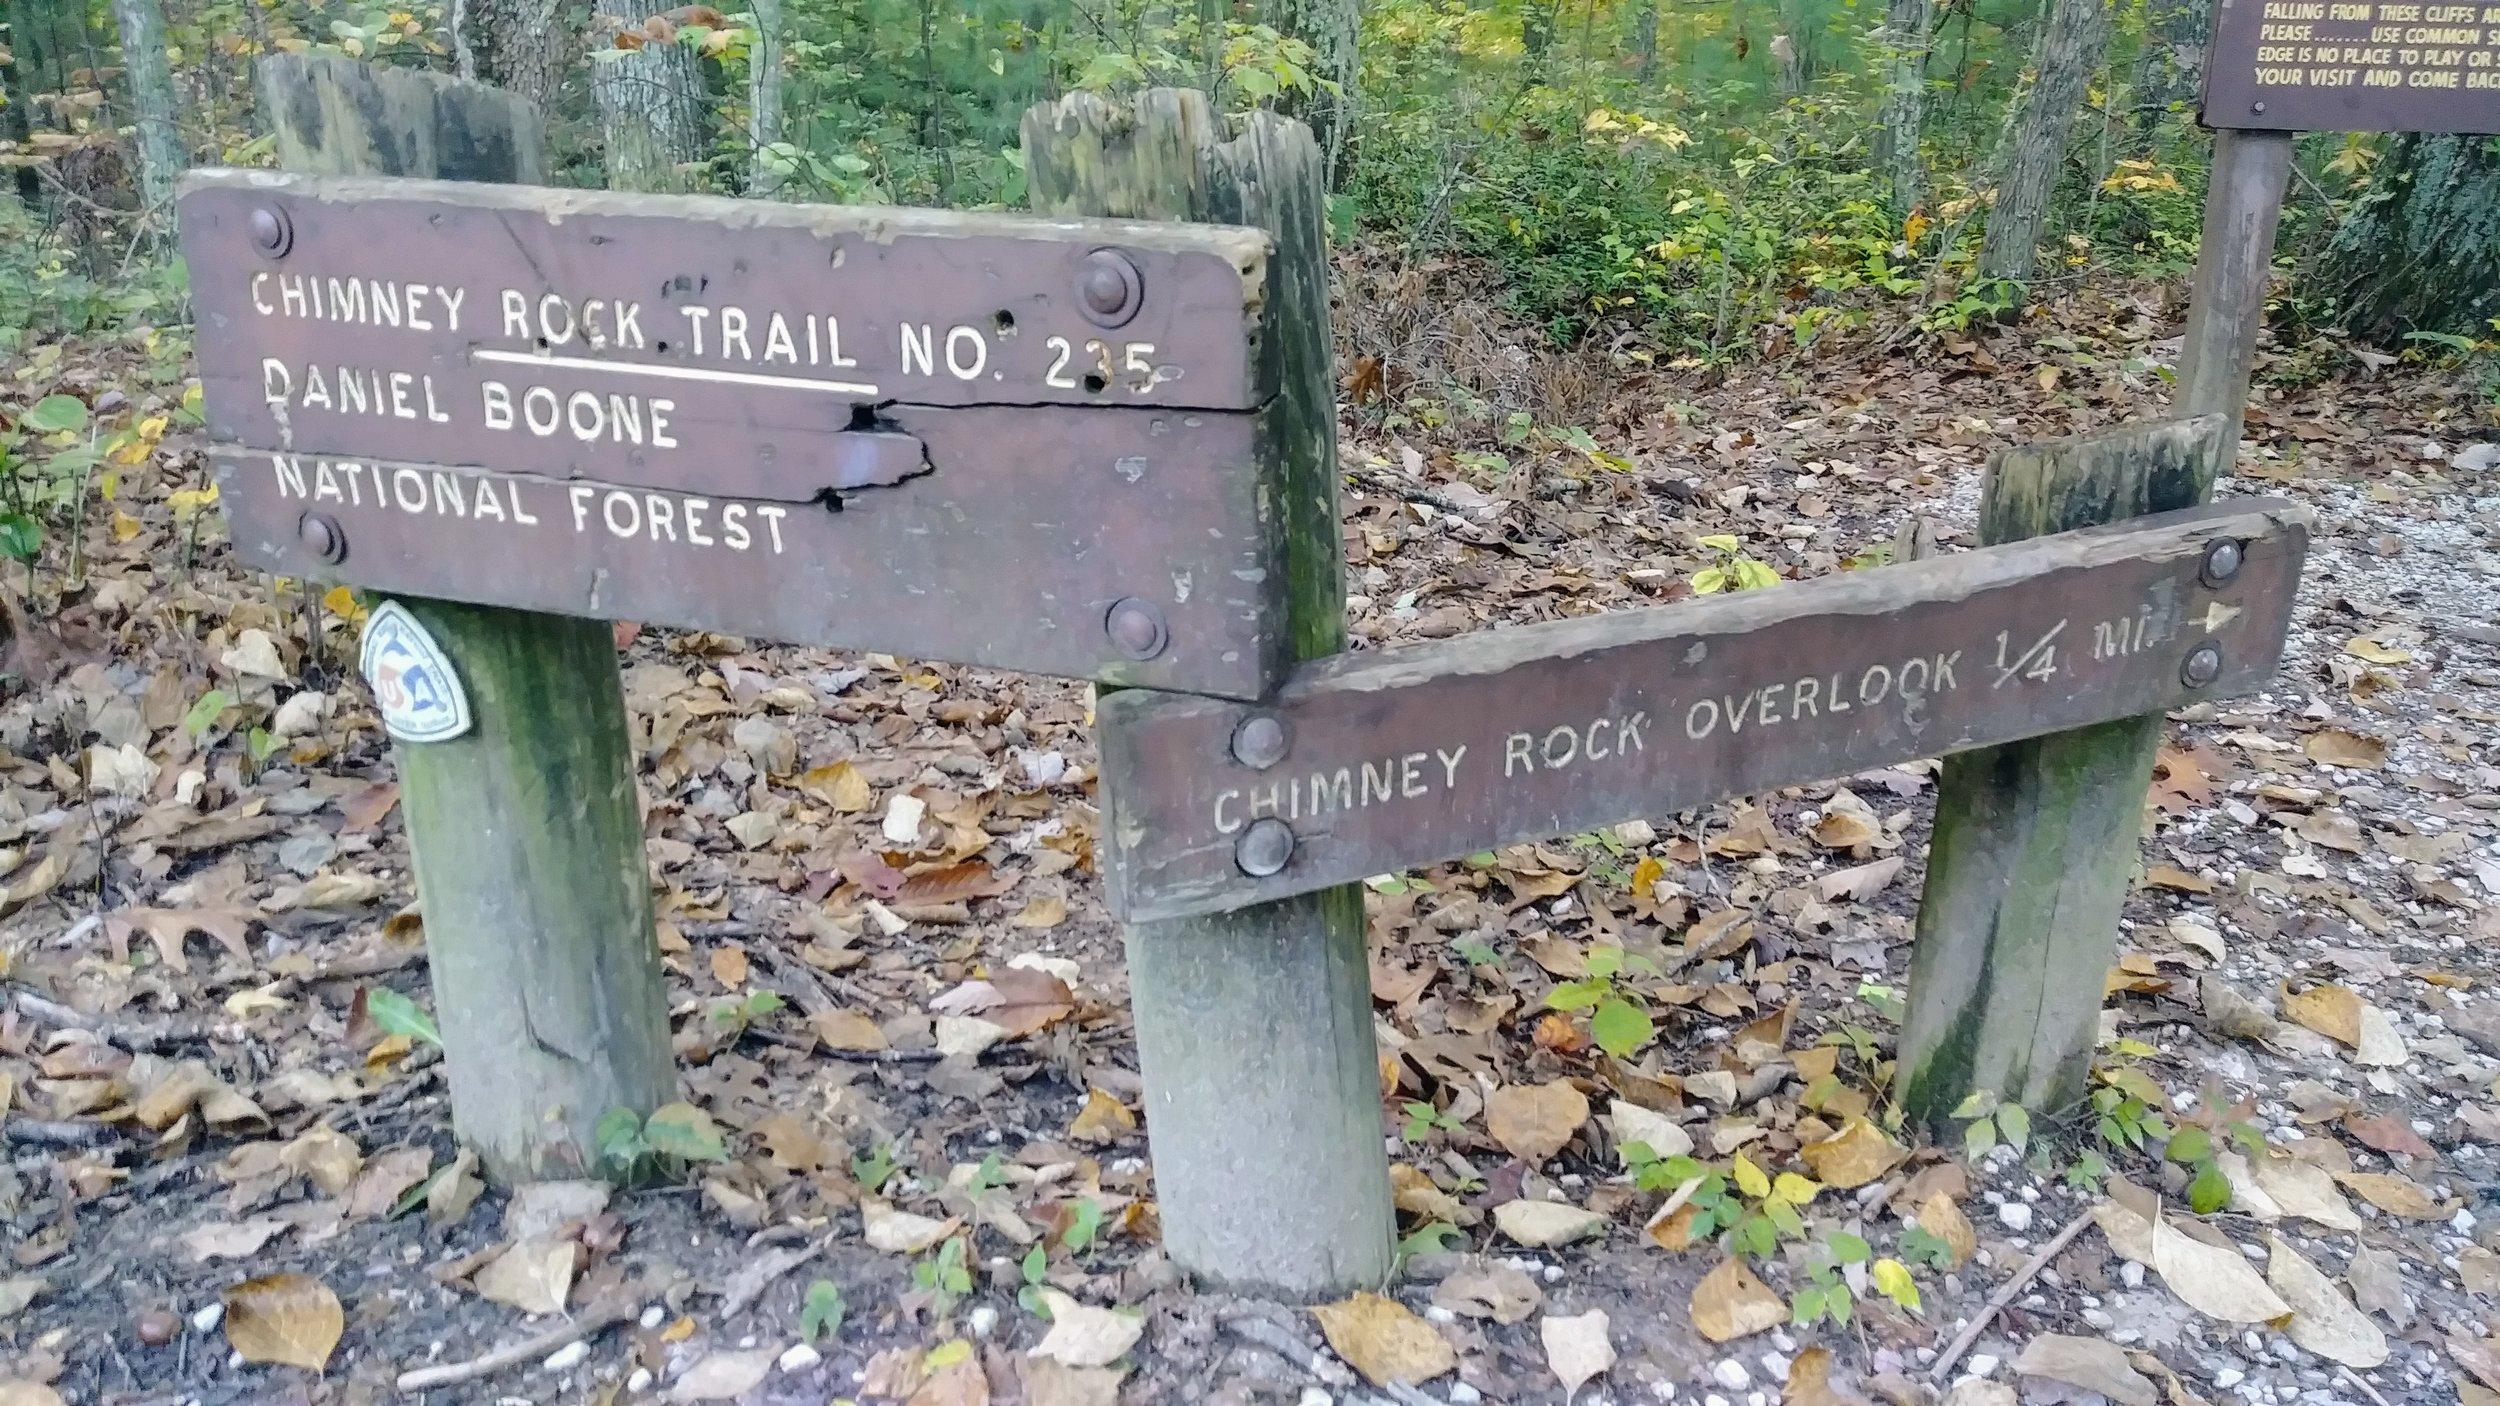 Signs at Chimney Rock Trailhead.